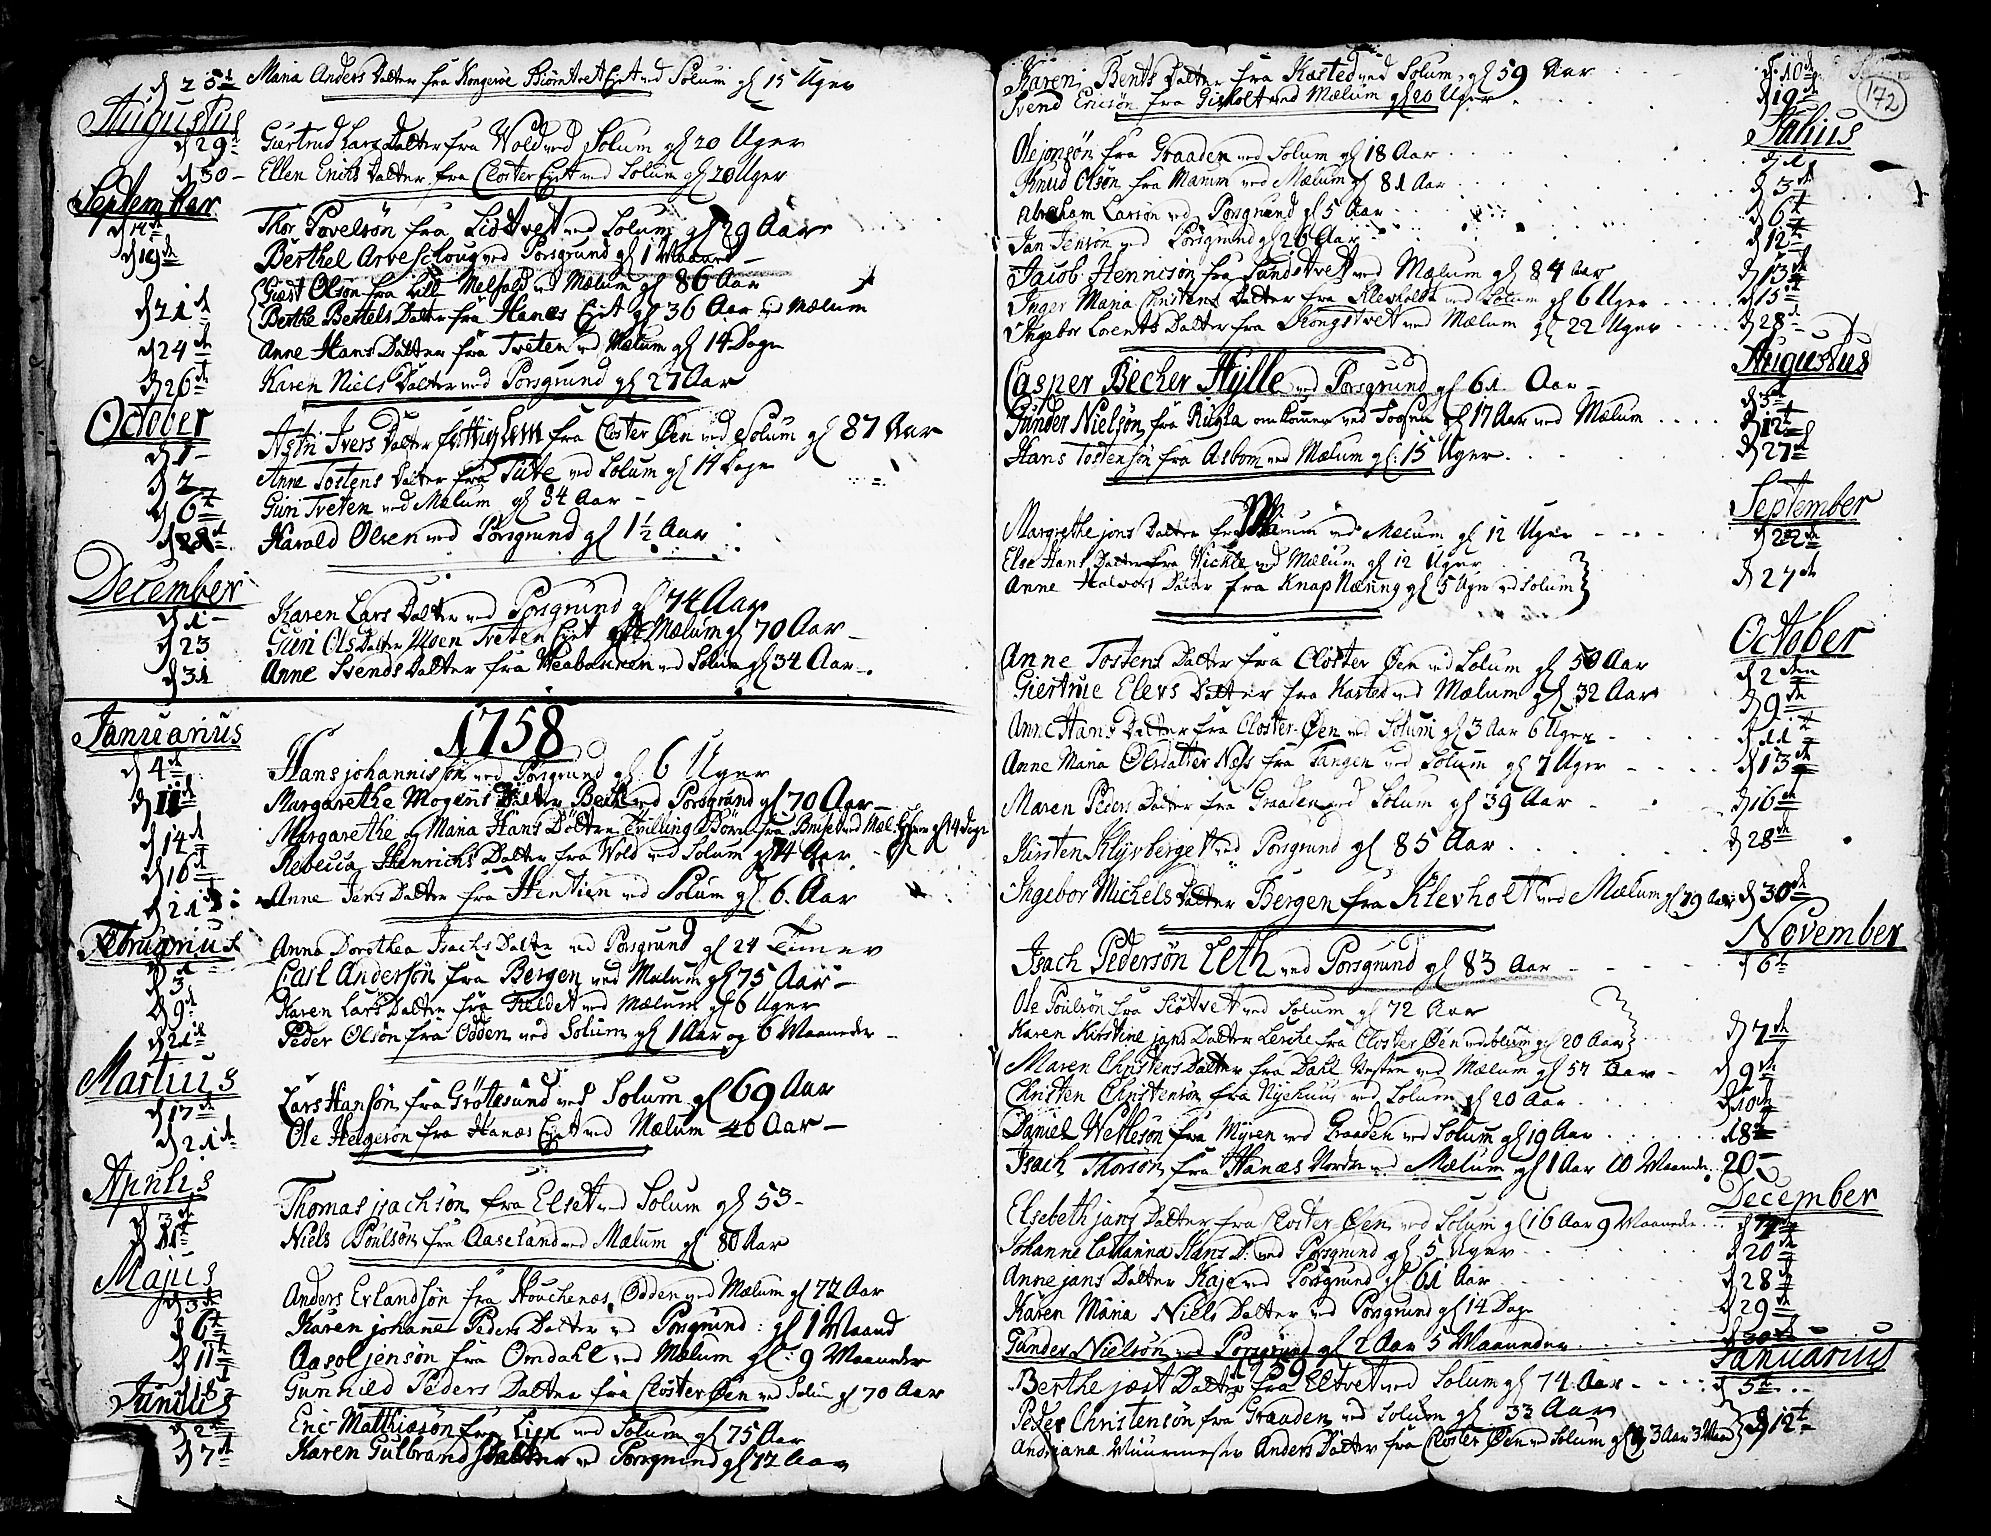 SAKO, Solum kirkebøker, F/Fa/L0002: Ministerialbok nr. I 2, 1713-1761, s. 172